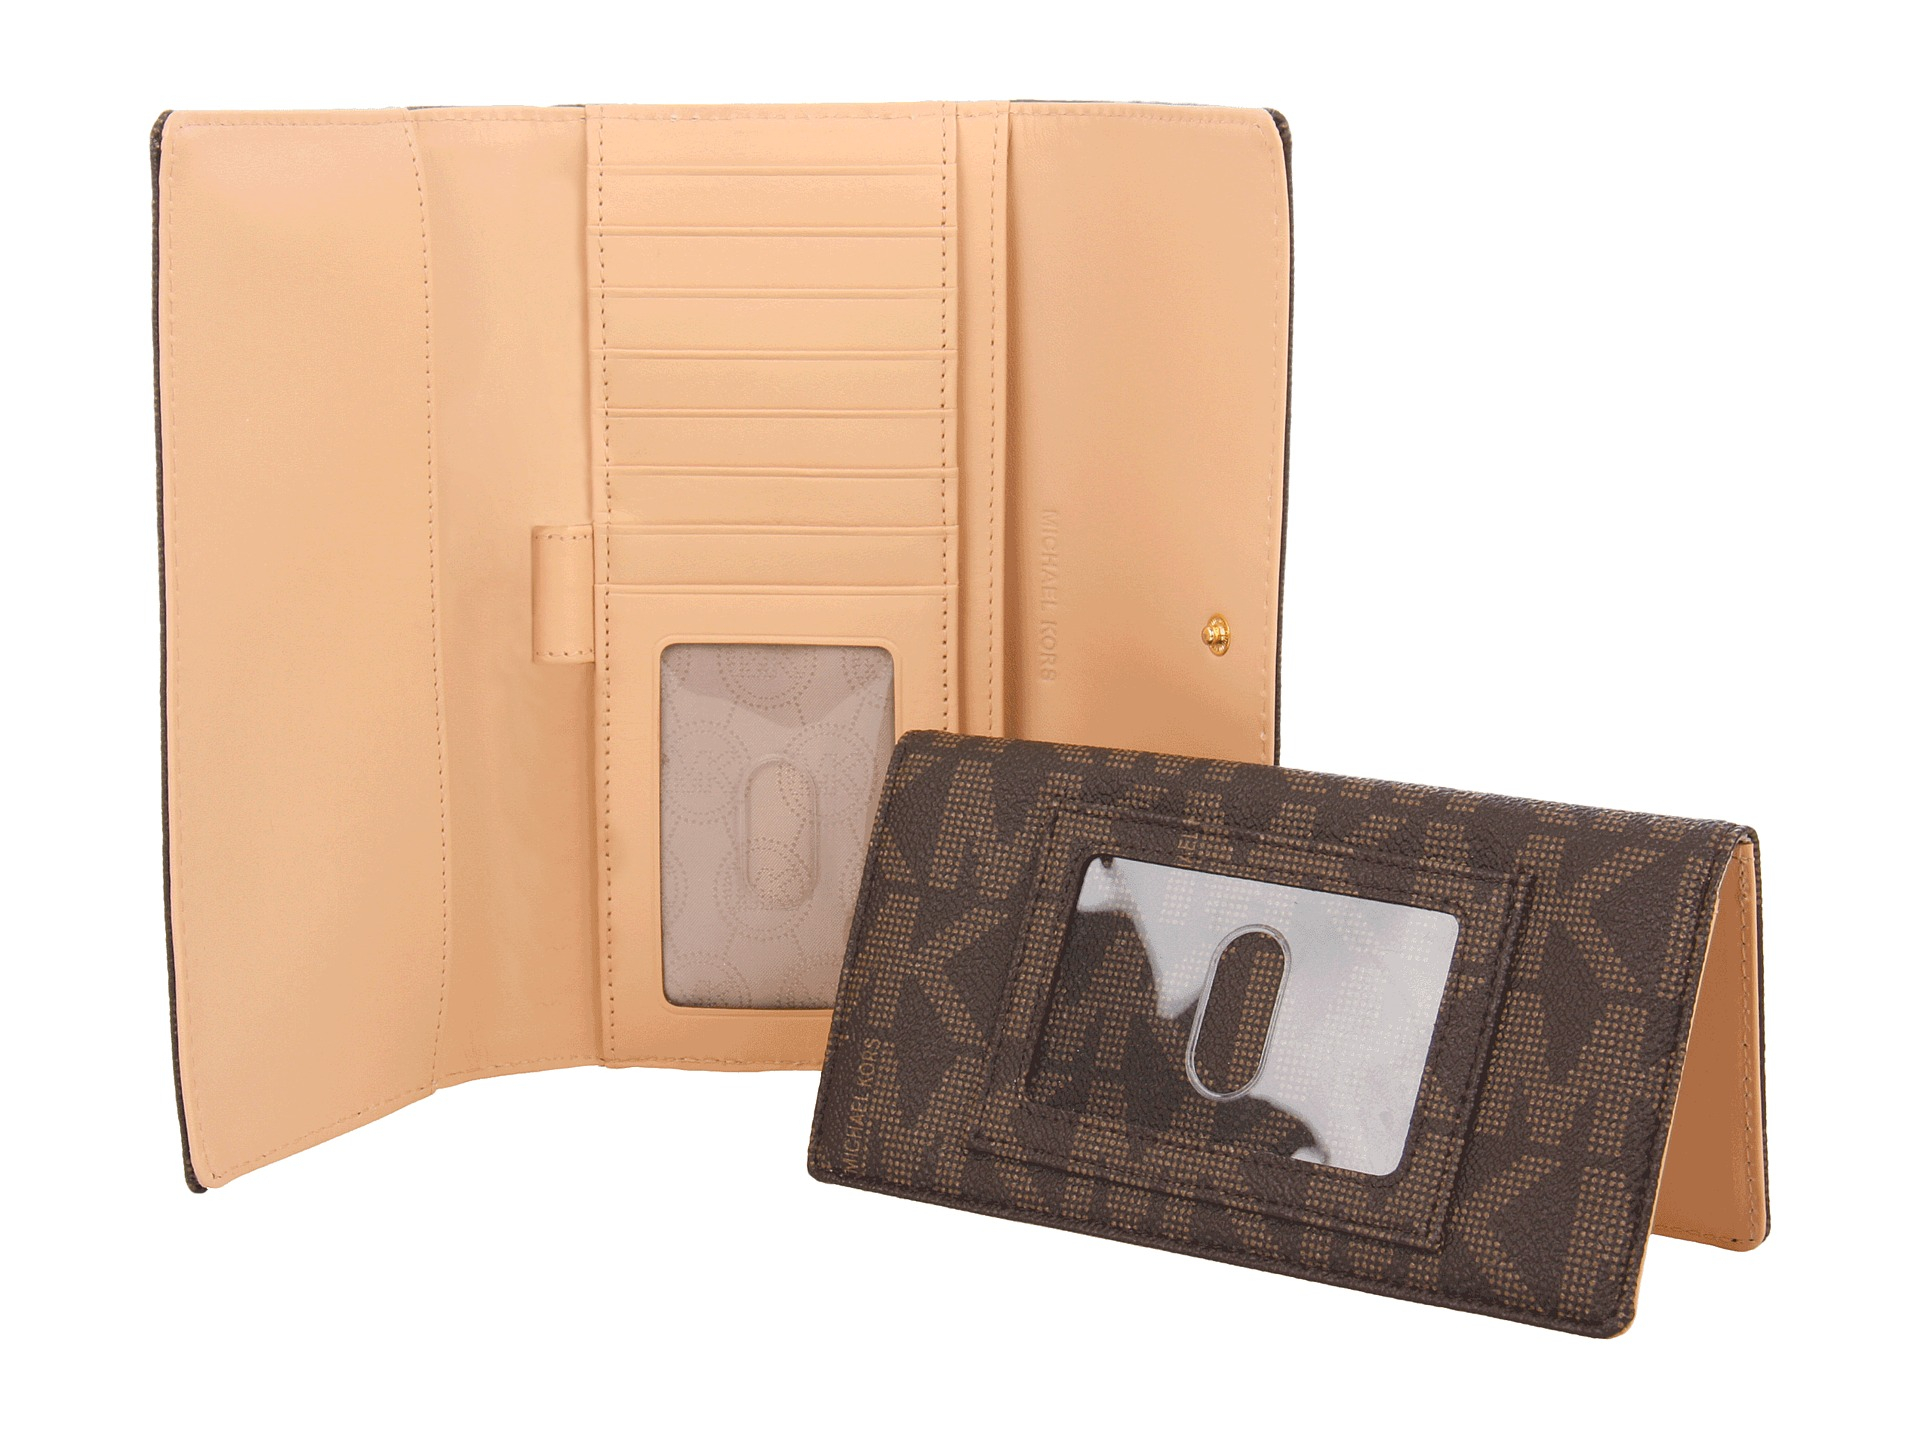 e6325ca23a9109 ... reduced lyst michael michael kors jet set checkbook wallet in brown  540b8 5b934 ...